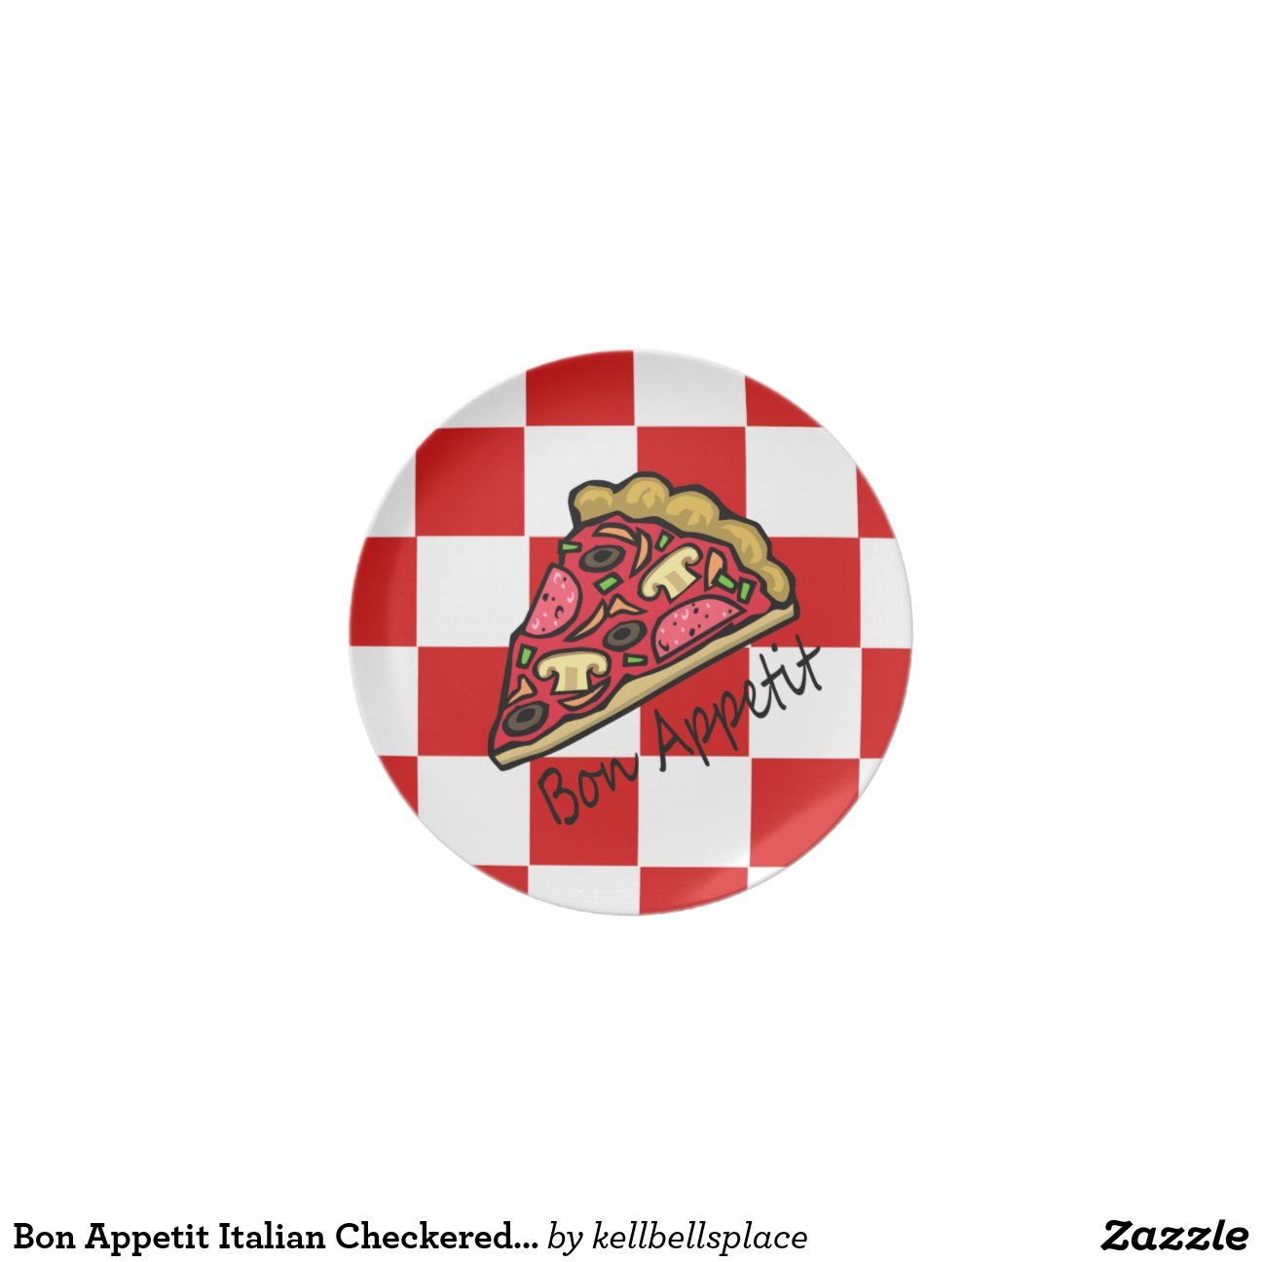 bon appetit italian checkered tablecloth pizza plates zazzle. Black Bedroom Furniture Sets. Home Design Ideas